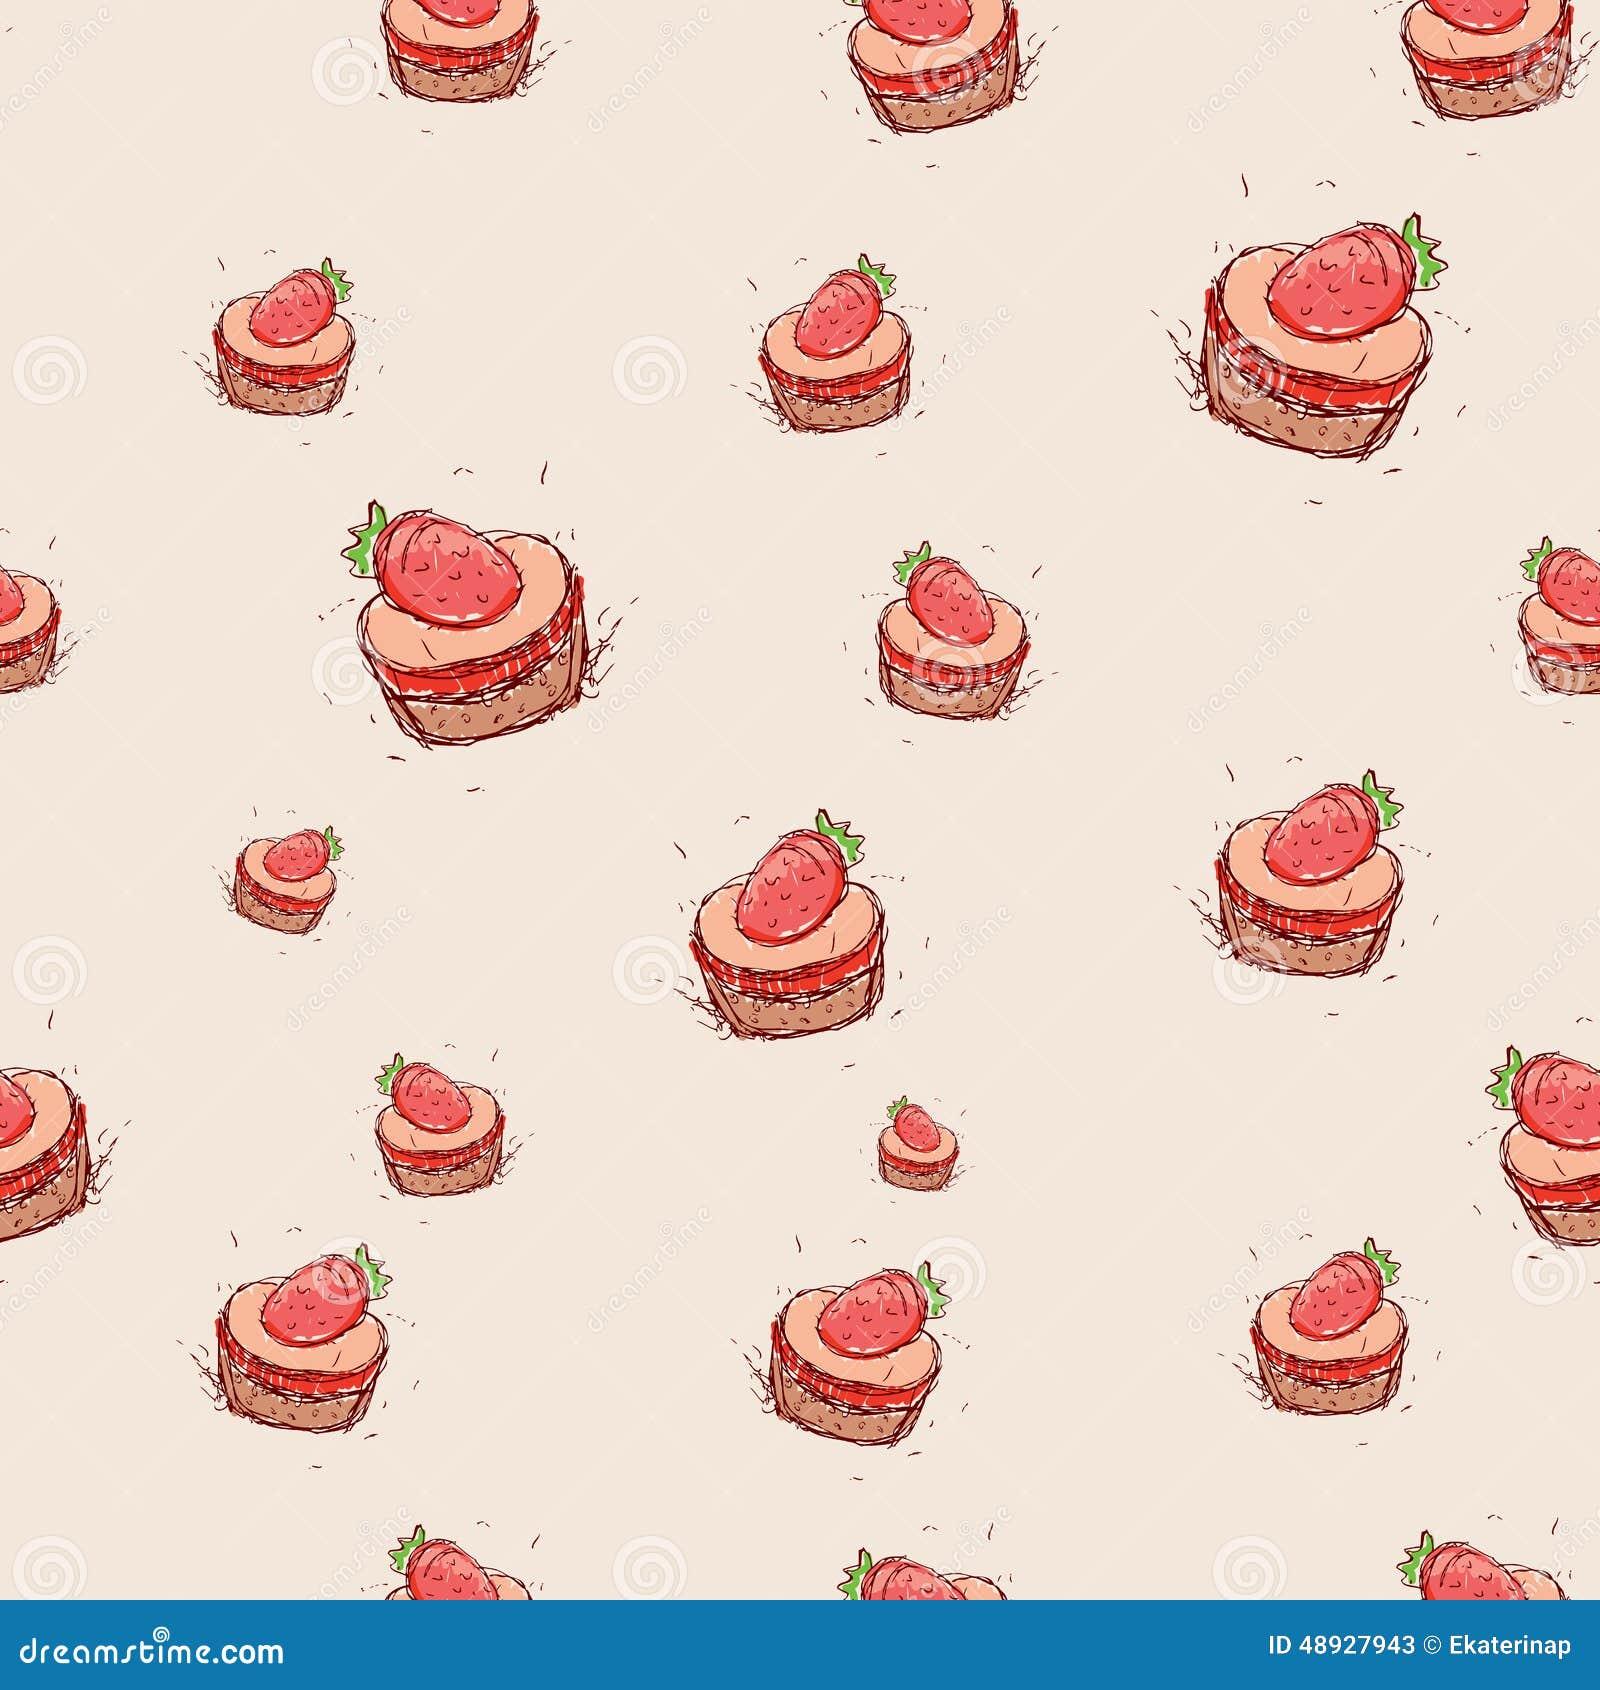 Cake Design Program Free Download : Cake With Strawberries Hand Drawn Sketch On Pink ...